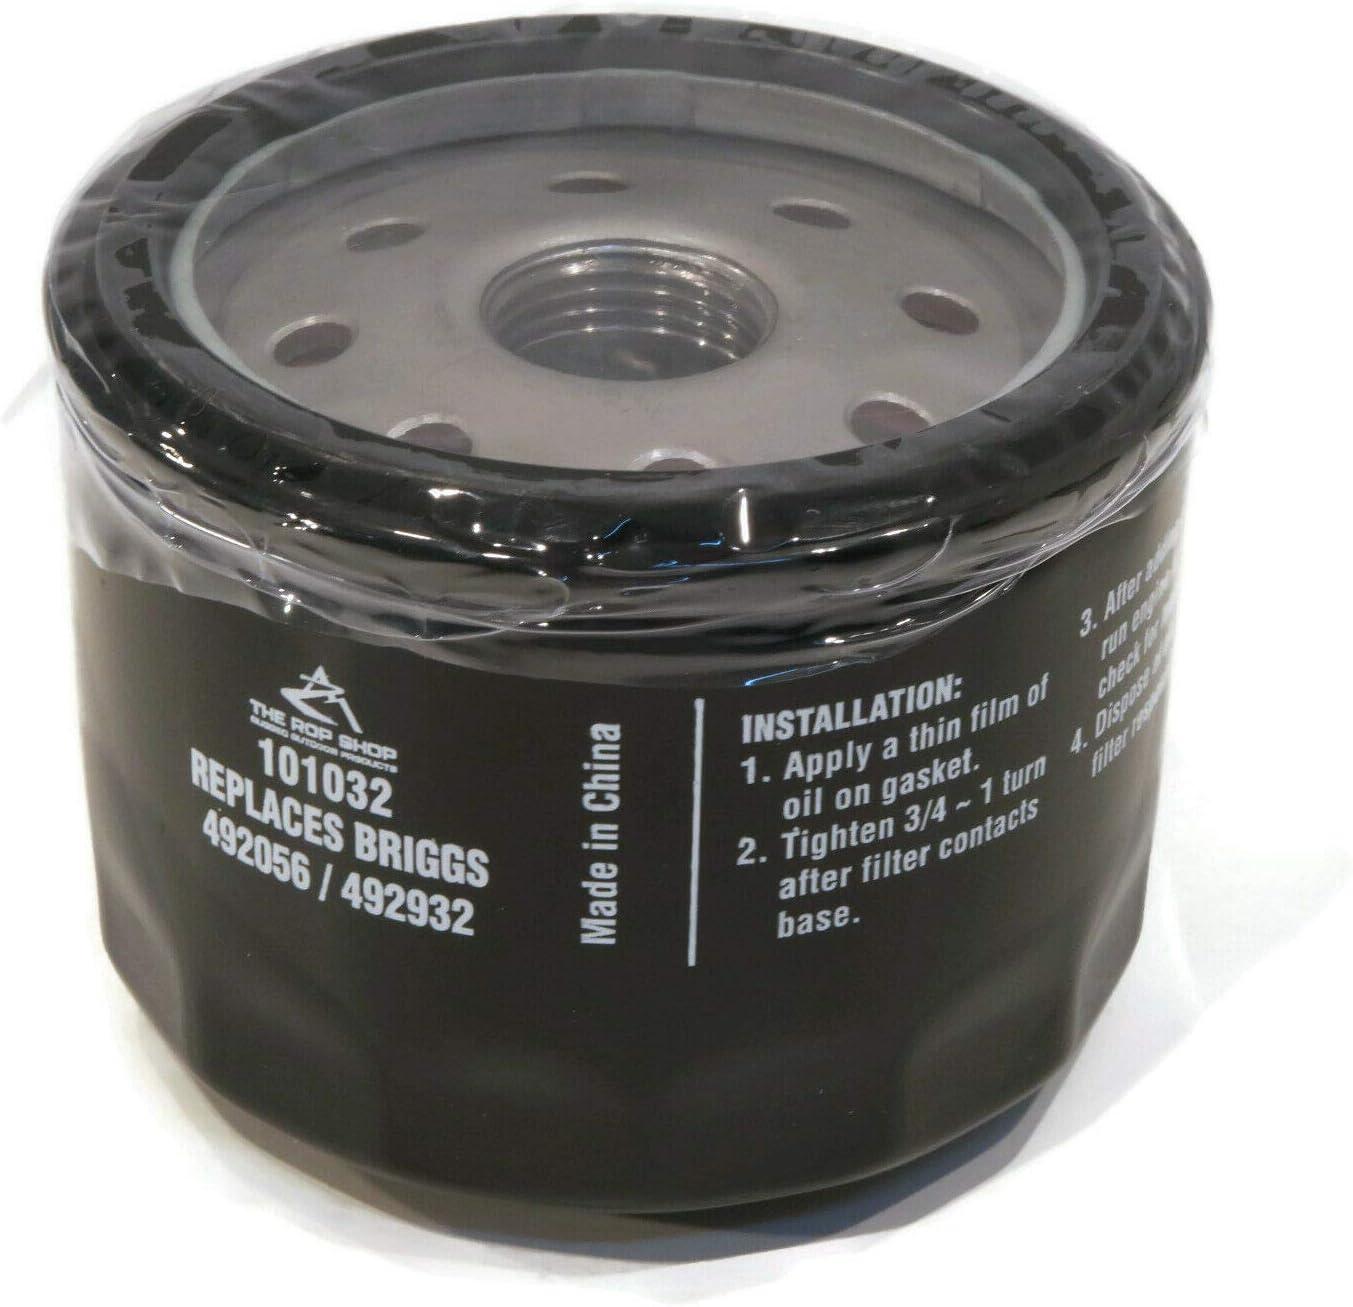 OIL fits LT1500 OFFicial site LT3800 LT4200 LT4600 T1000 T supreme R1000 RER1000 RZT34